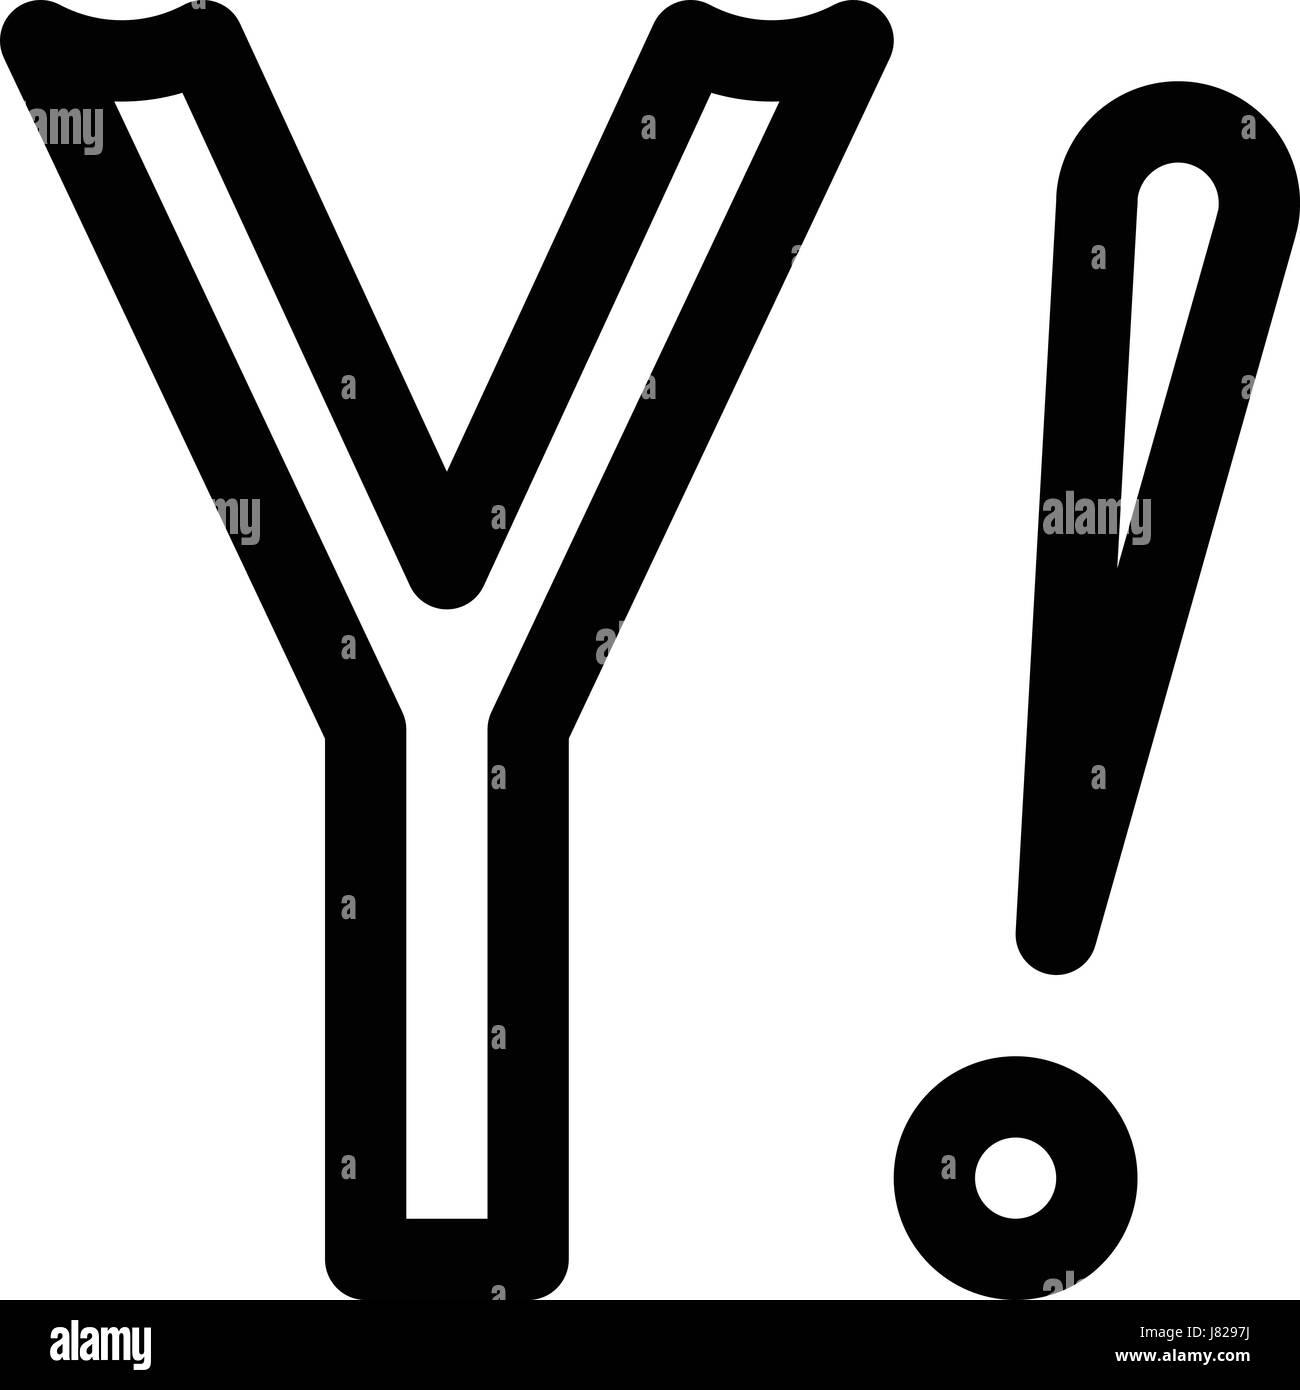 yahoo Stock Vector Art & Illustration, Vector Image